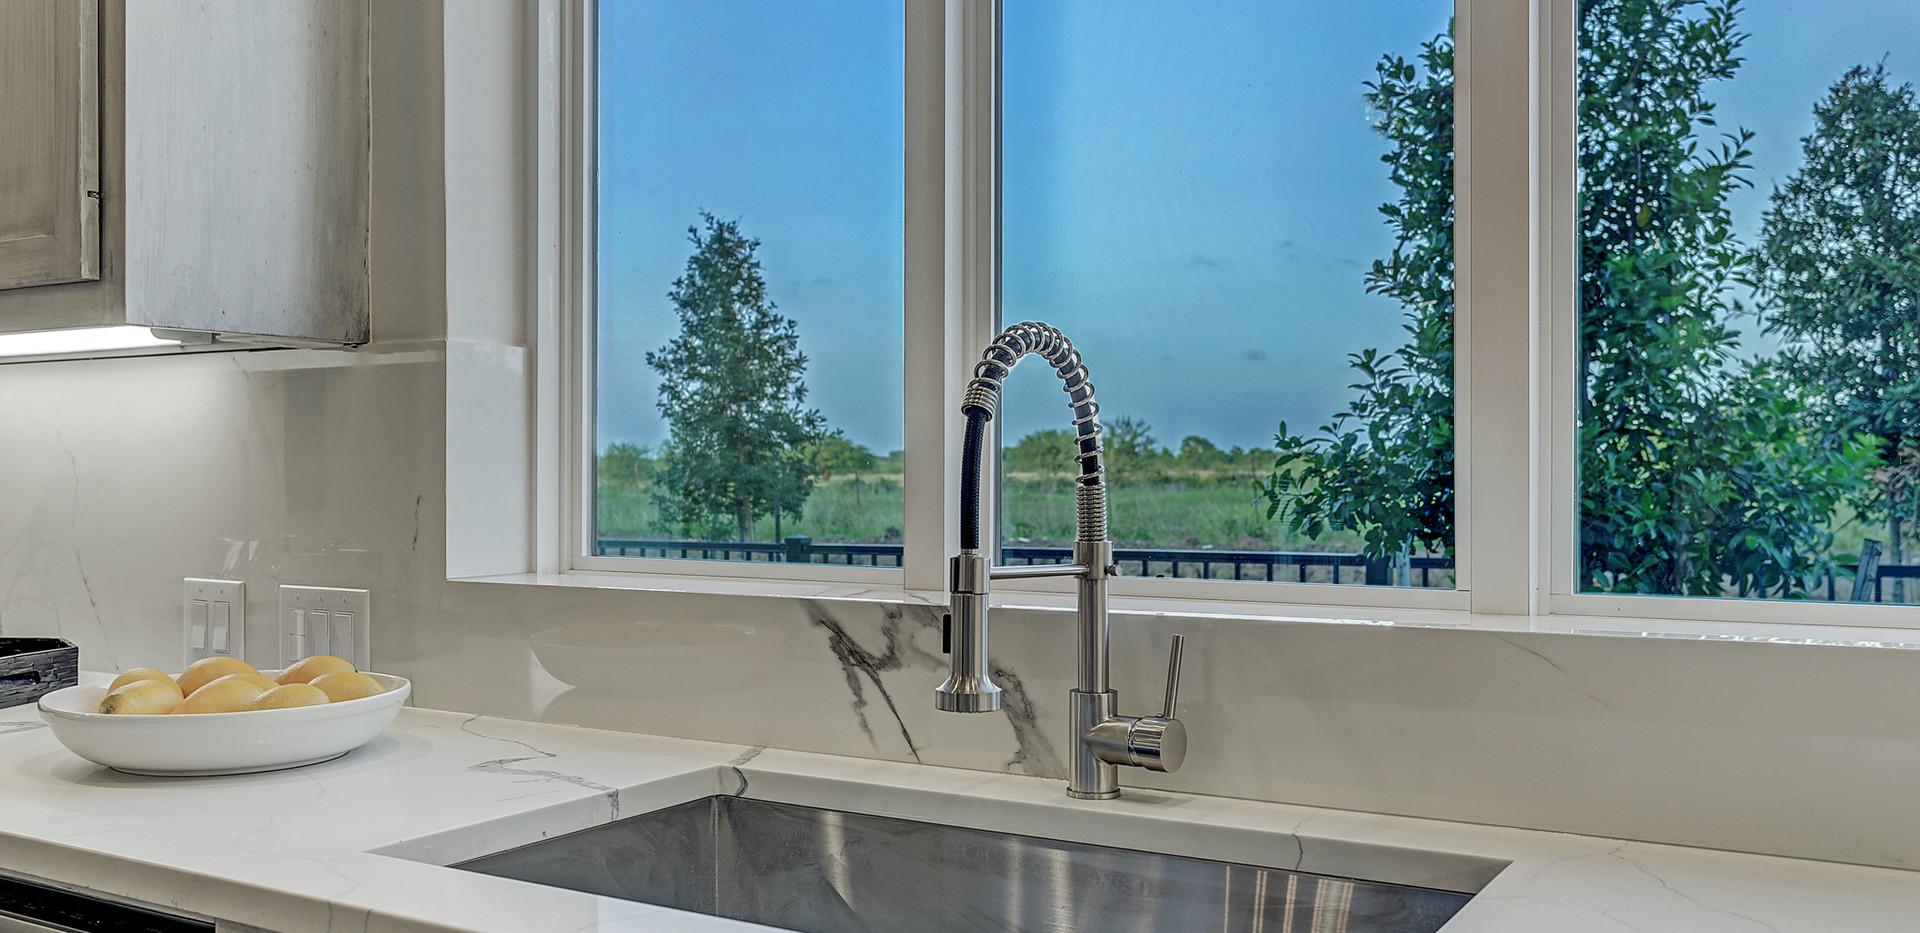 Taj Residences Kitchen Faucet